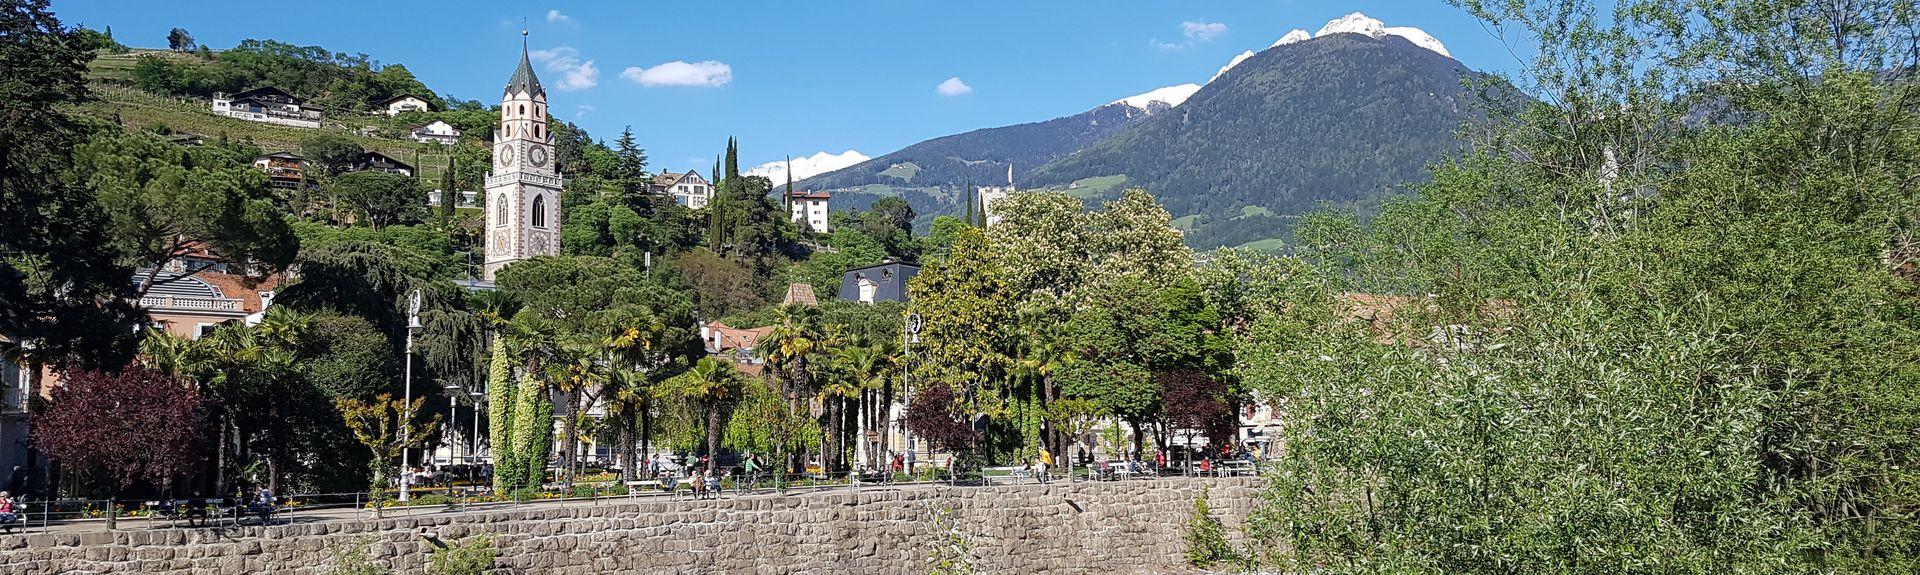 Gargazon, Alto Adige, Trentino-Alto Adige/South Tyrol, Italy